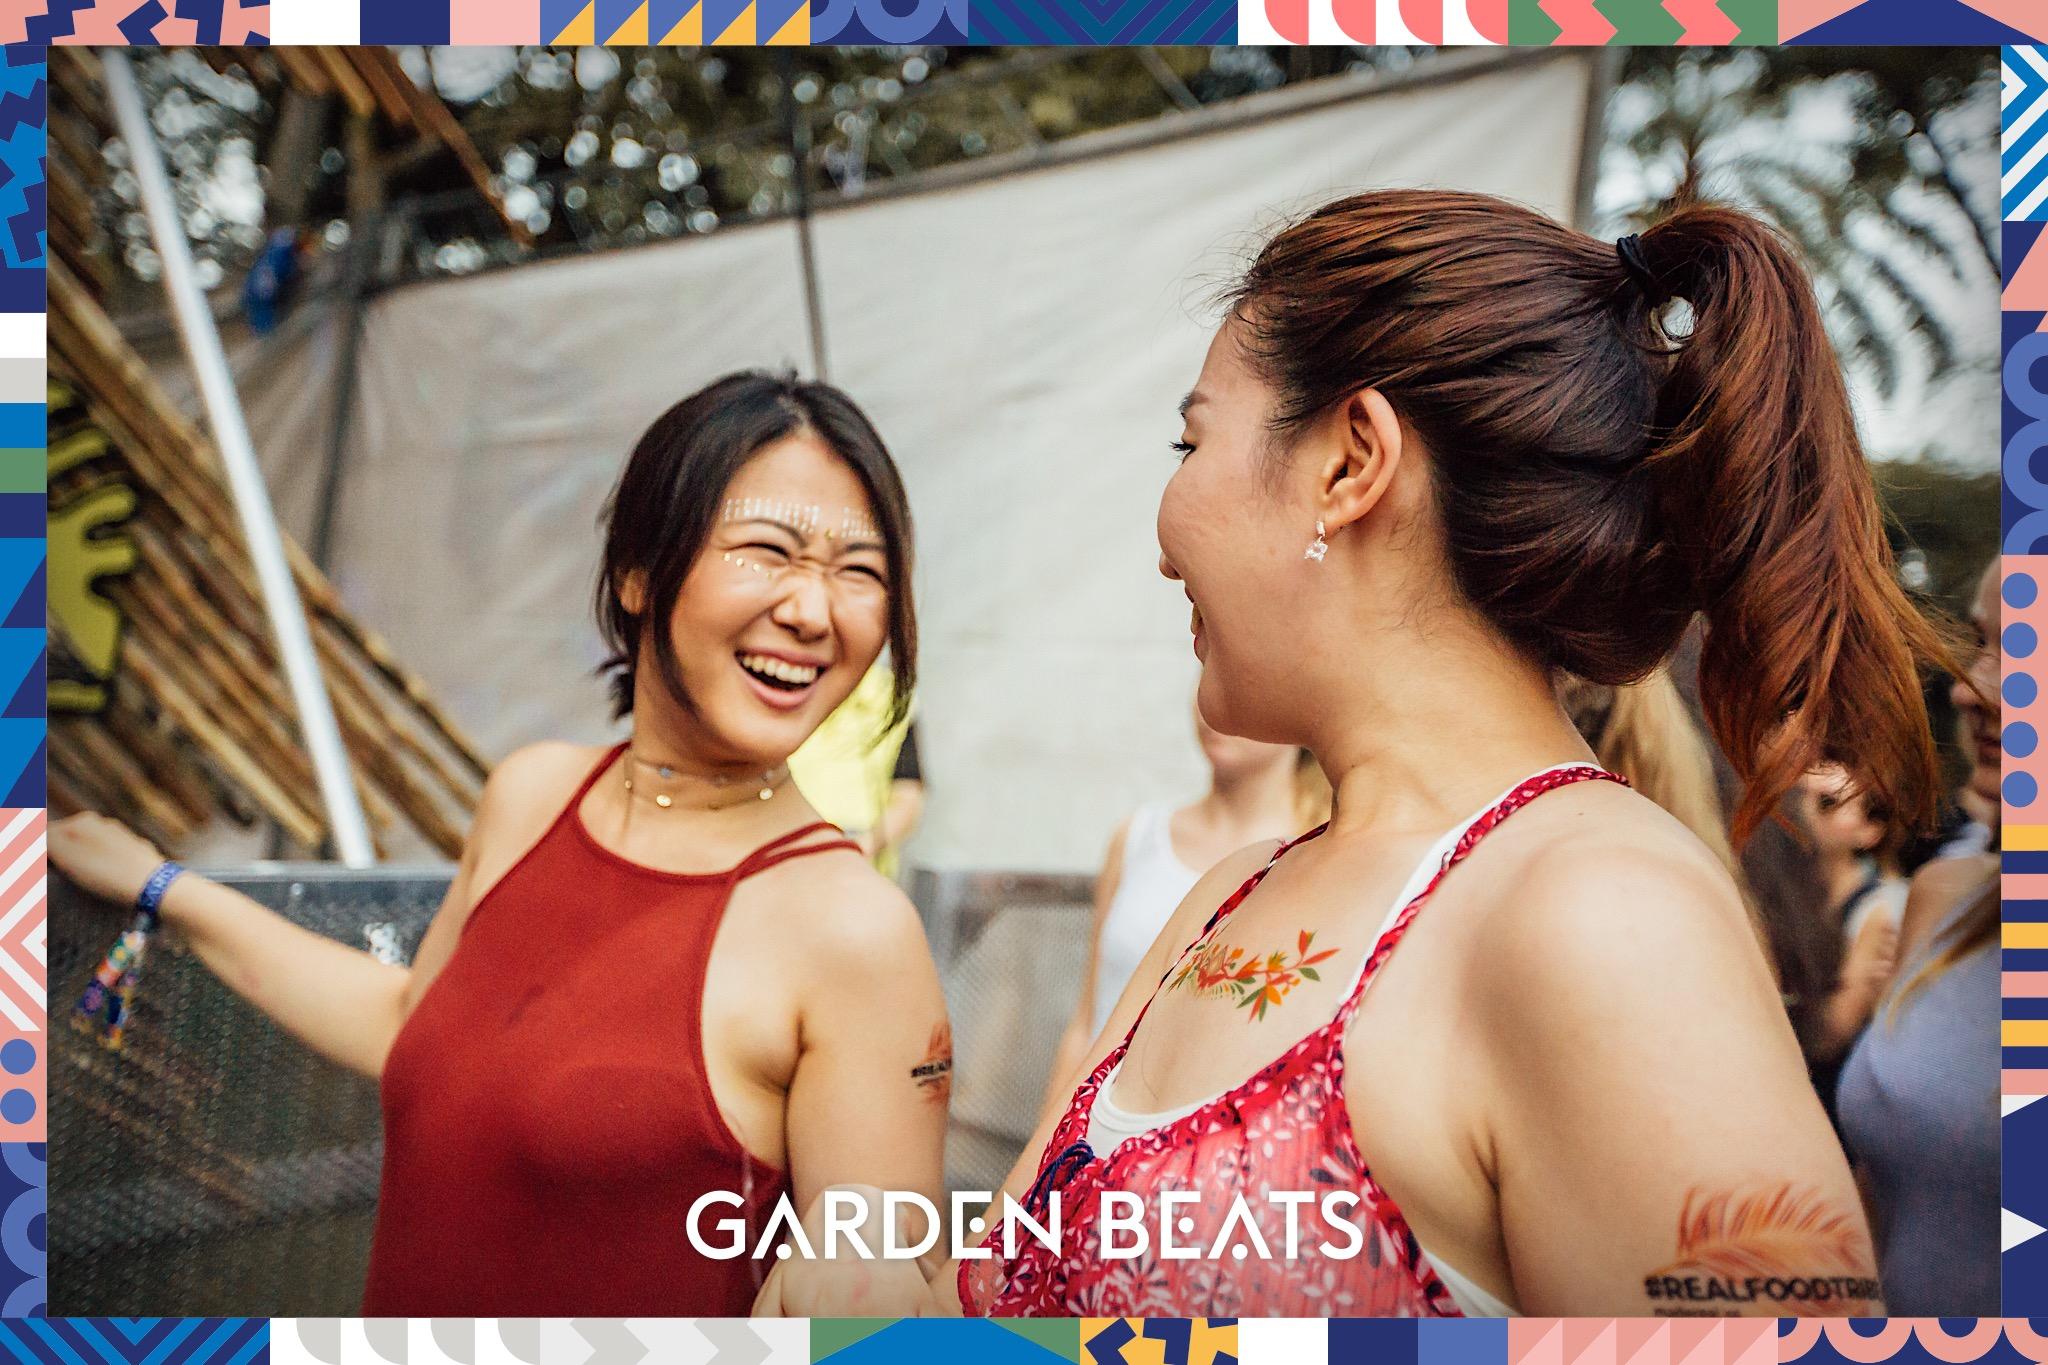 18032017_GardenBeats_Colossal680_WatermarkedGB.jpg